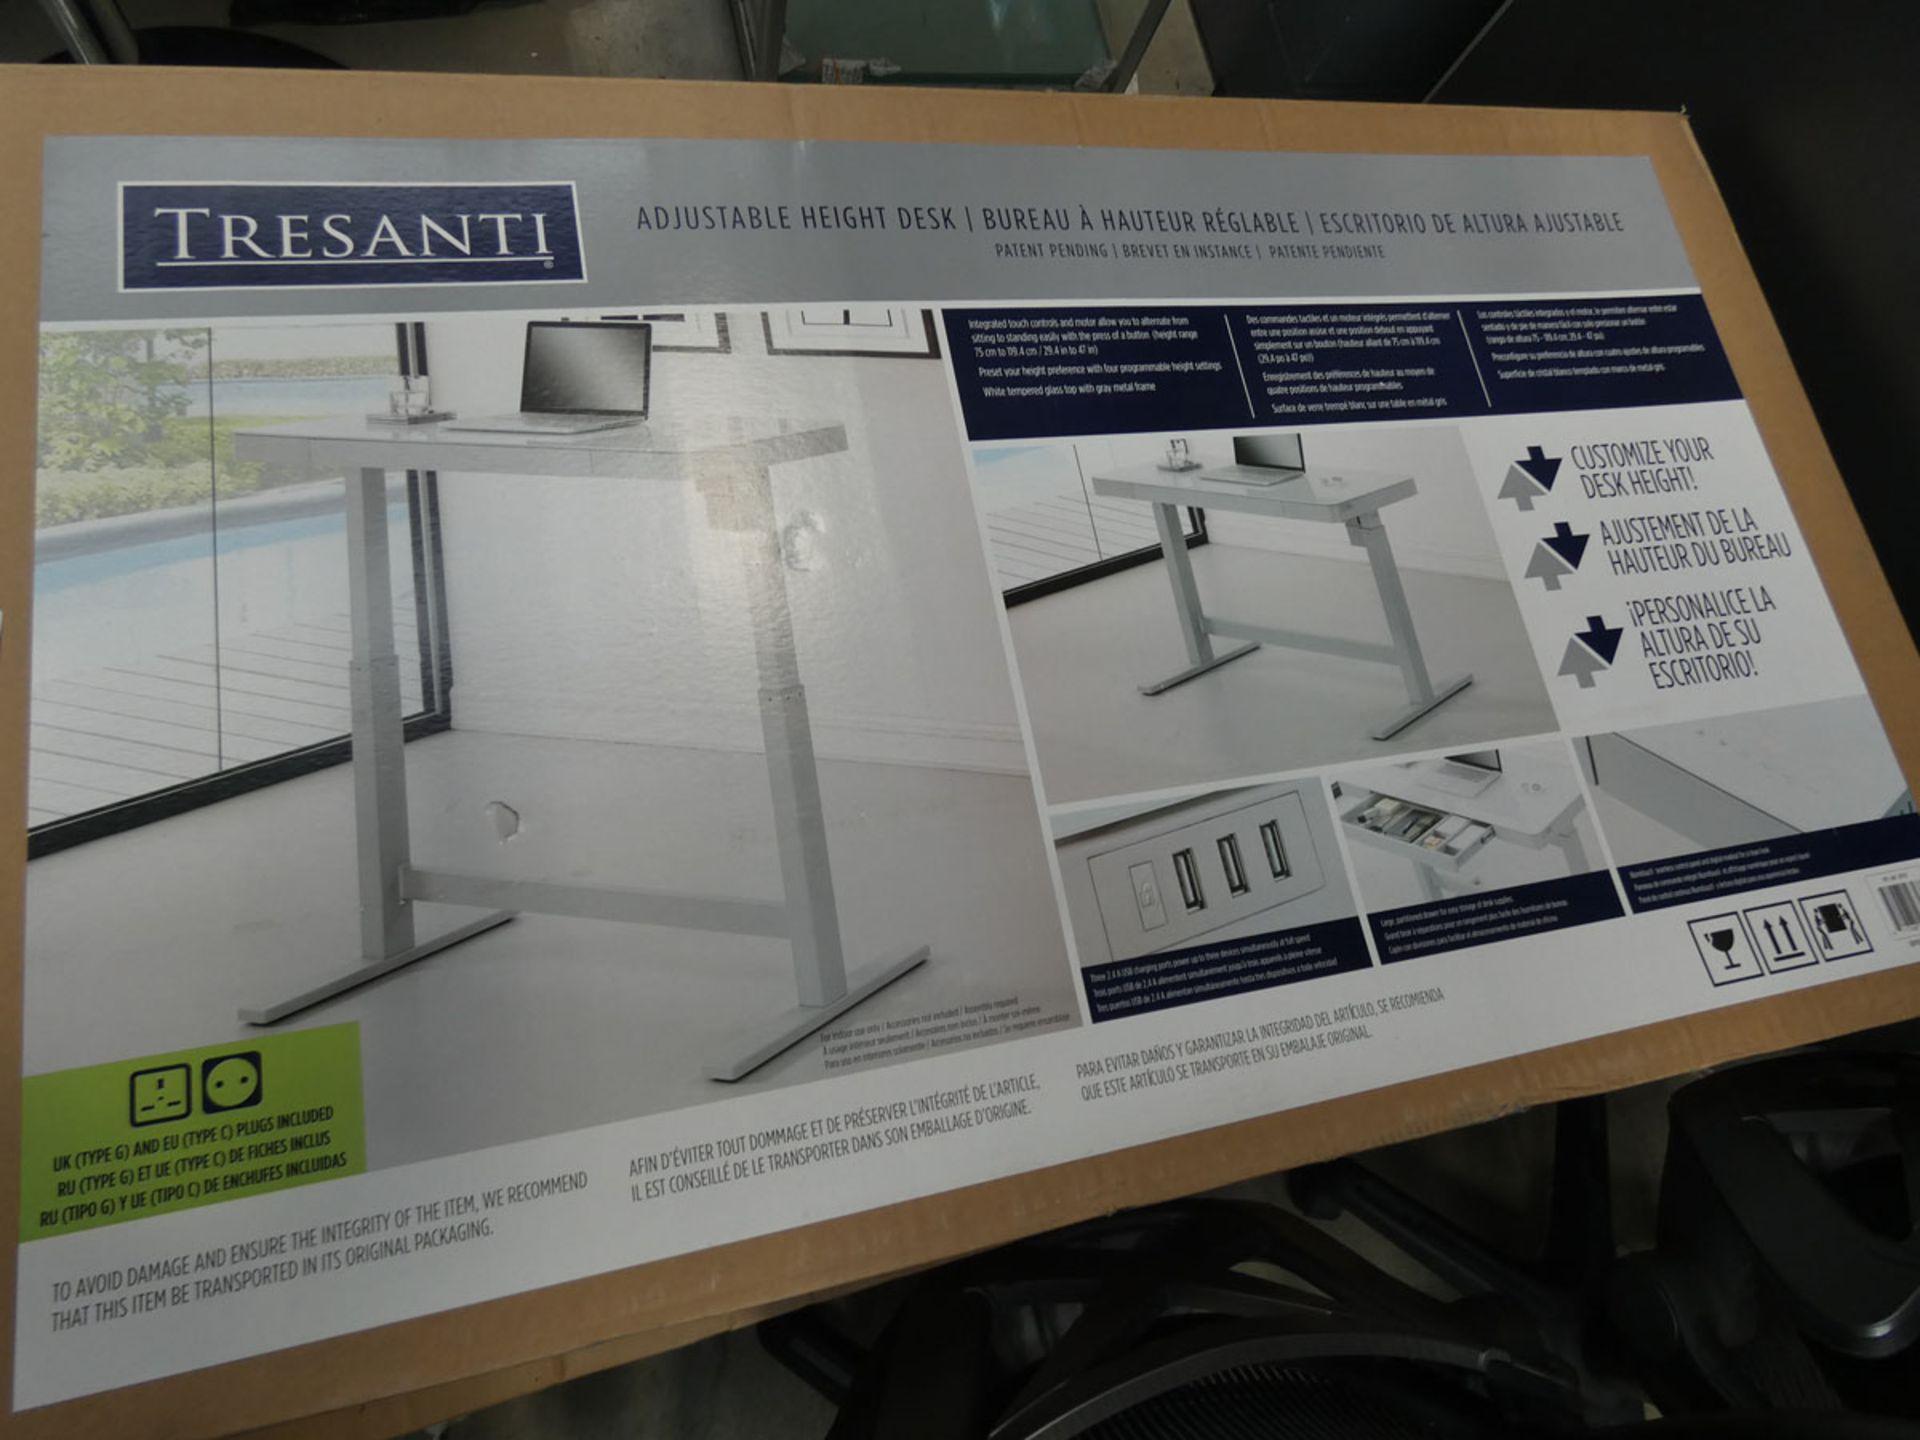 Tresanti boxed Rise and Fall desk